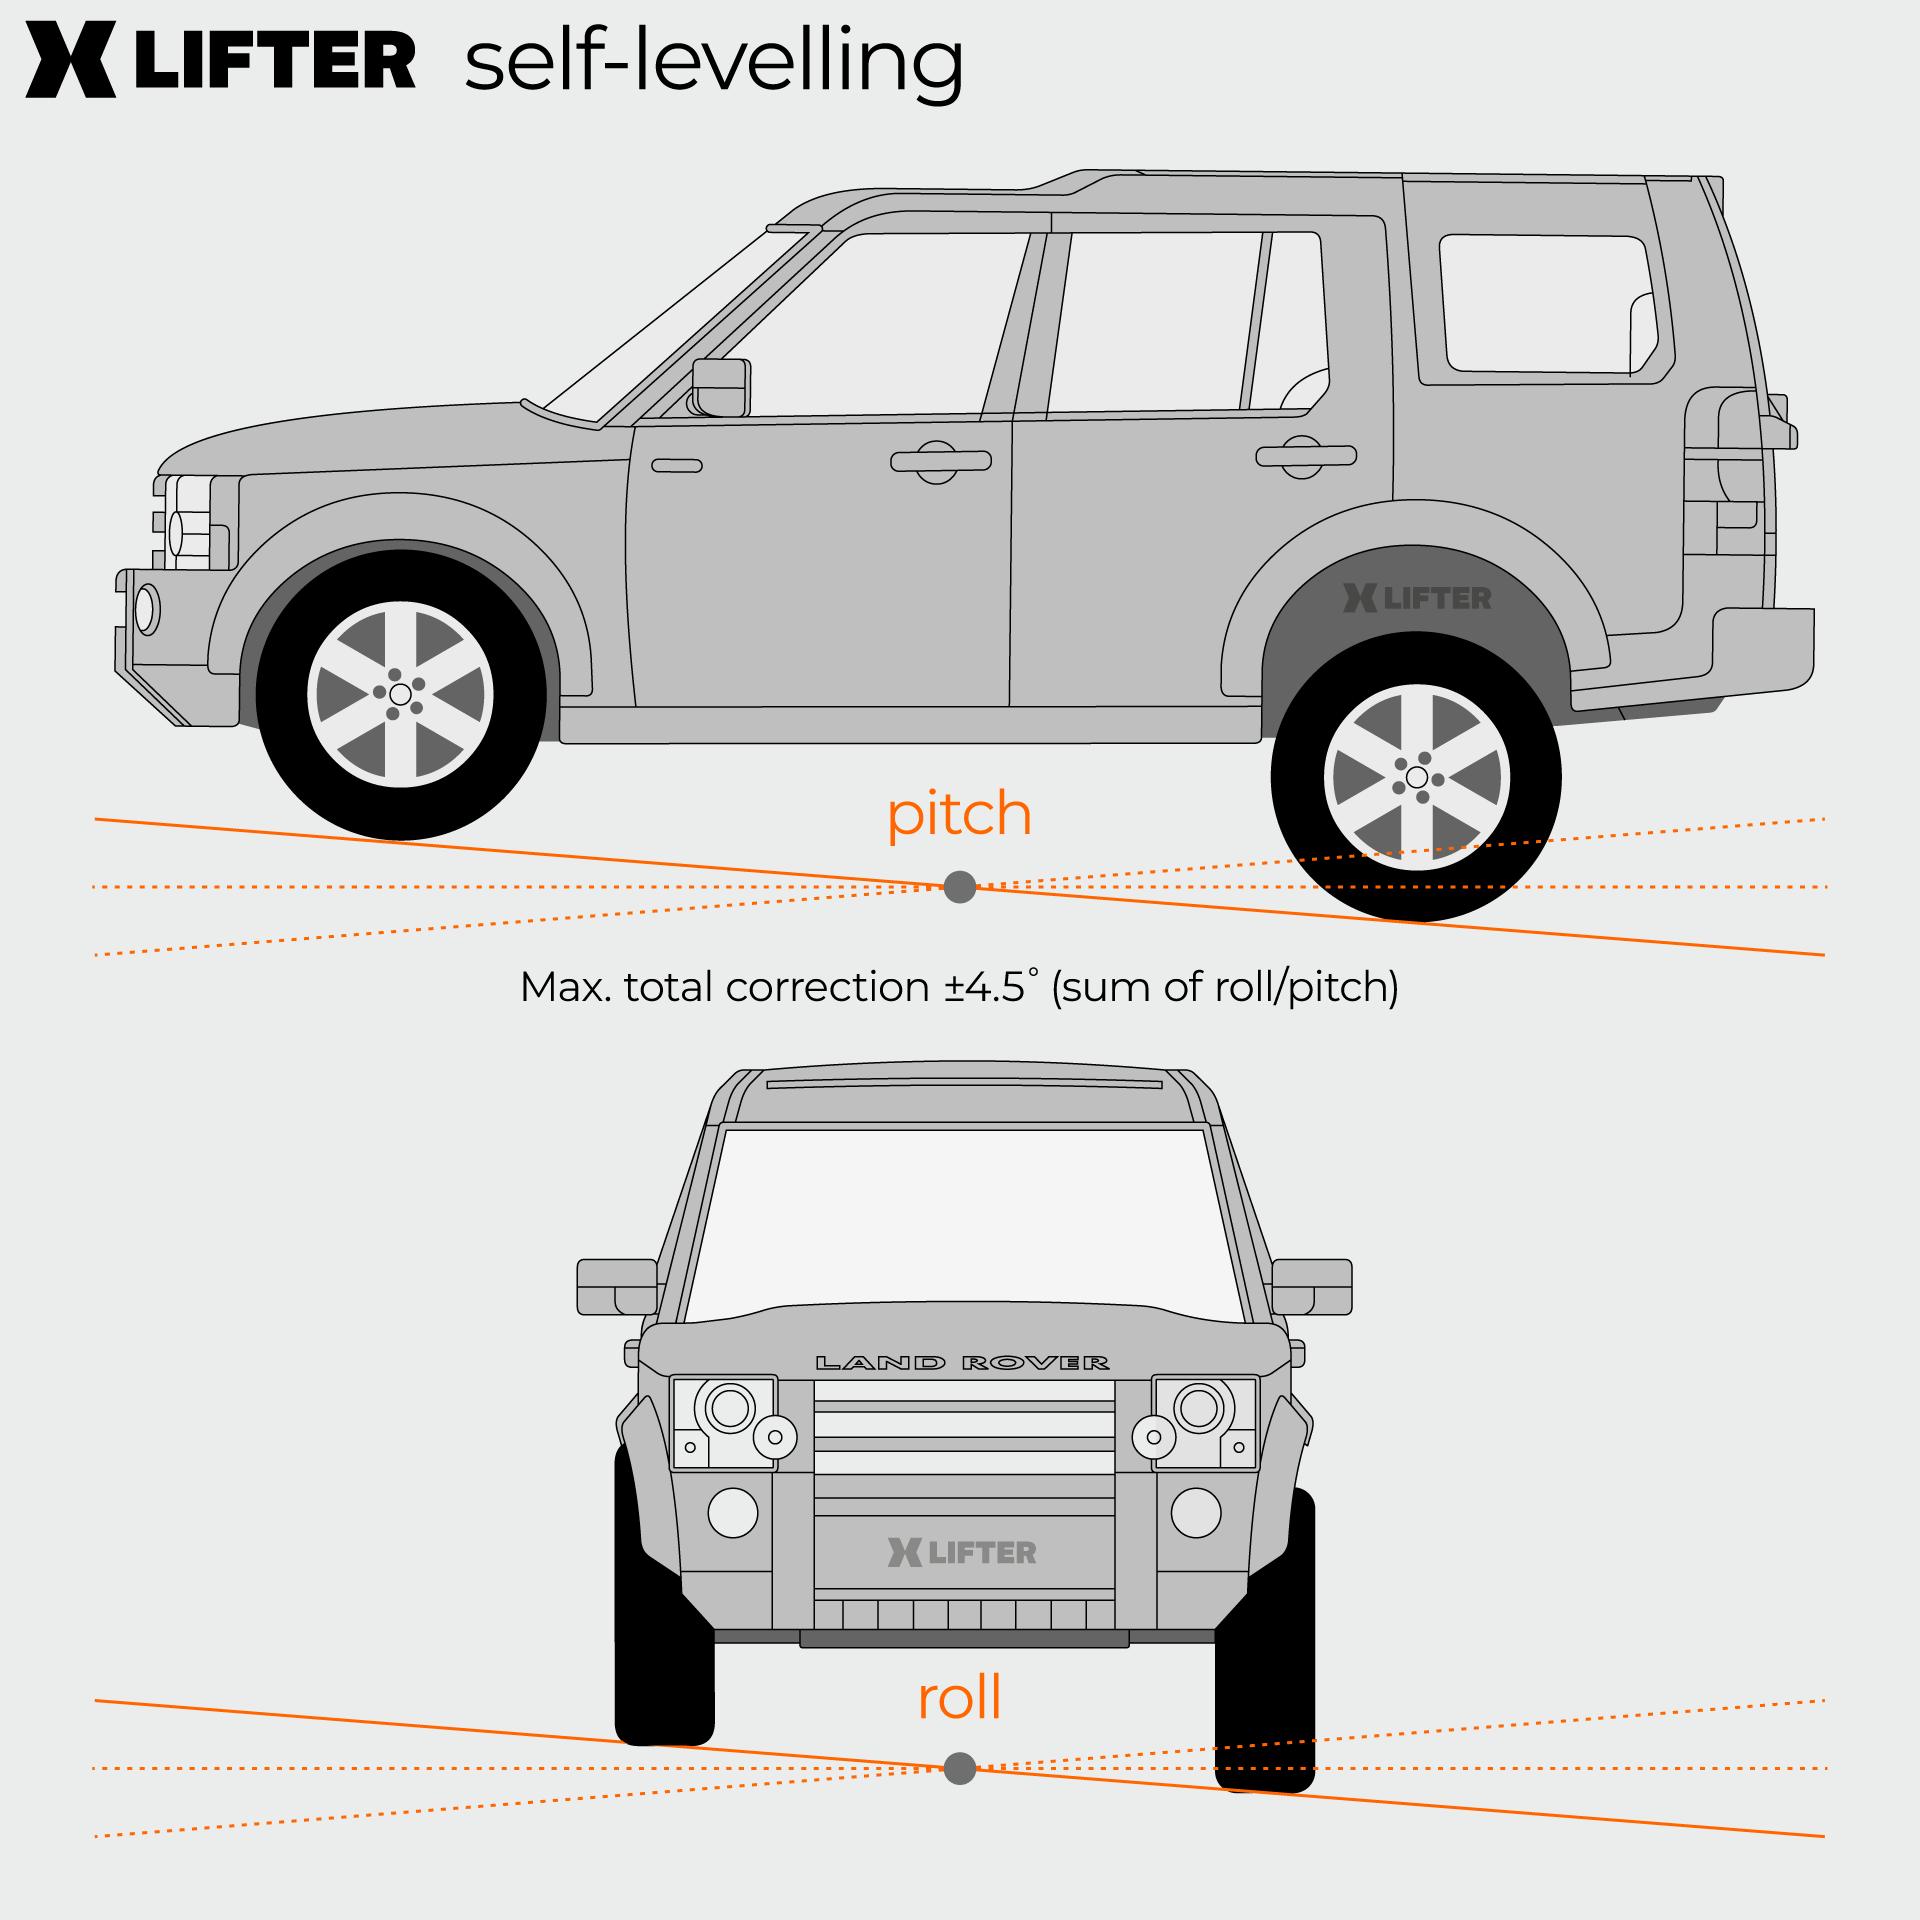 XLifter self-leveling diagram